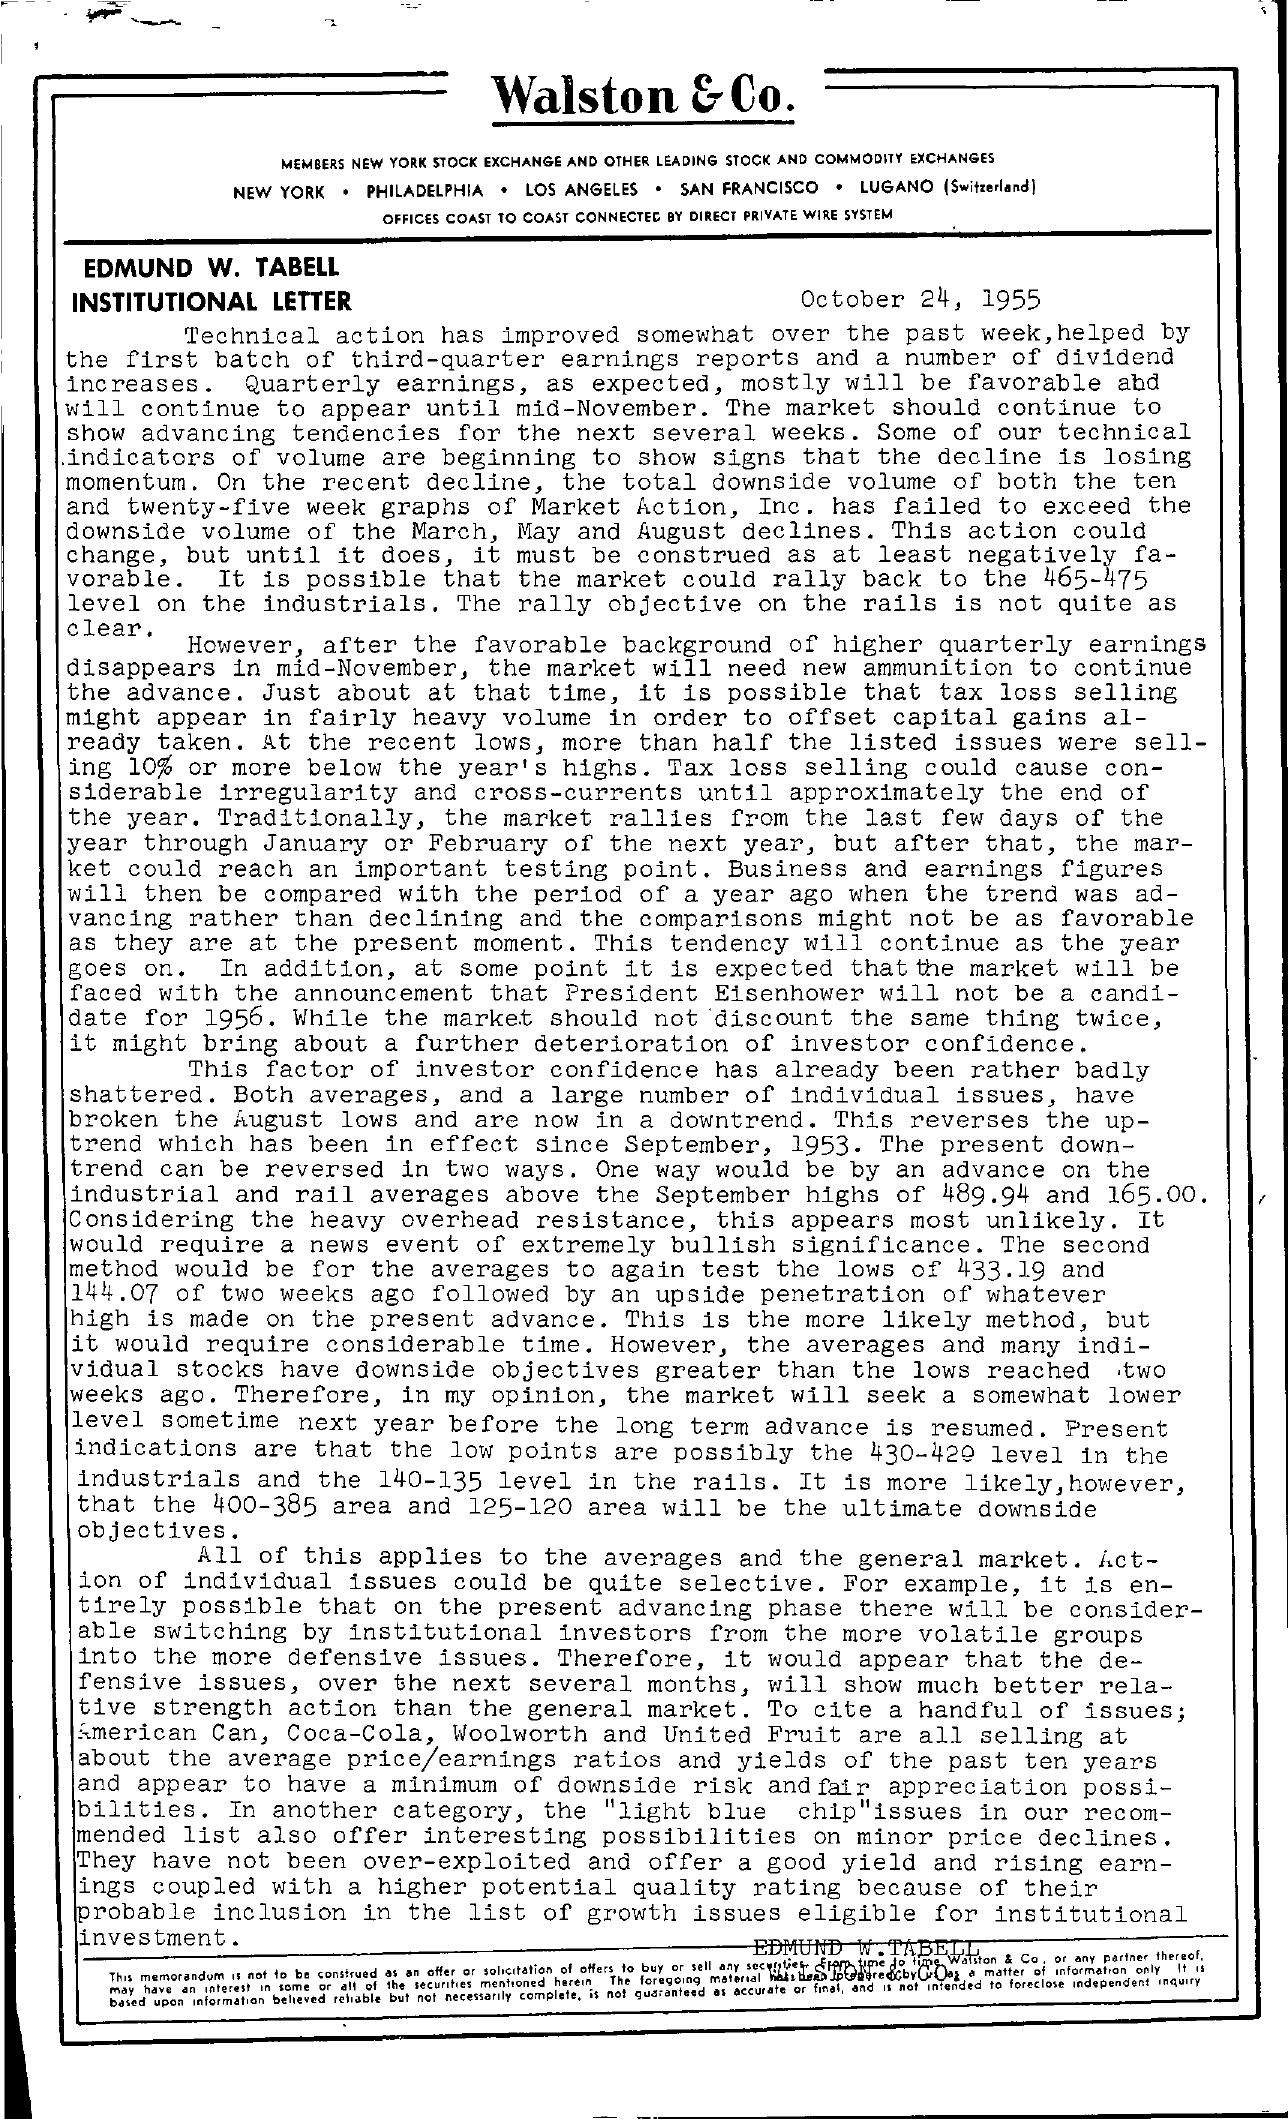 Tabell's Market Letter - October 24, 1955